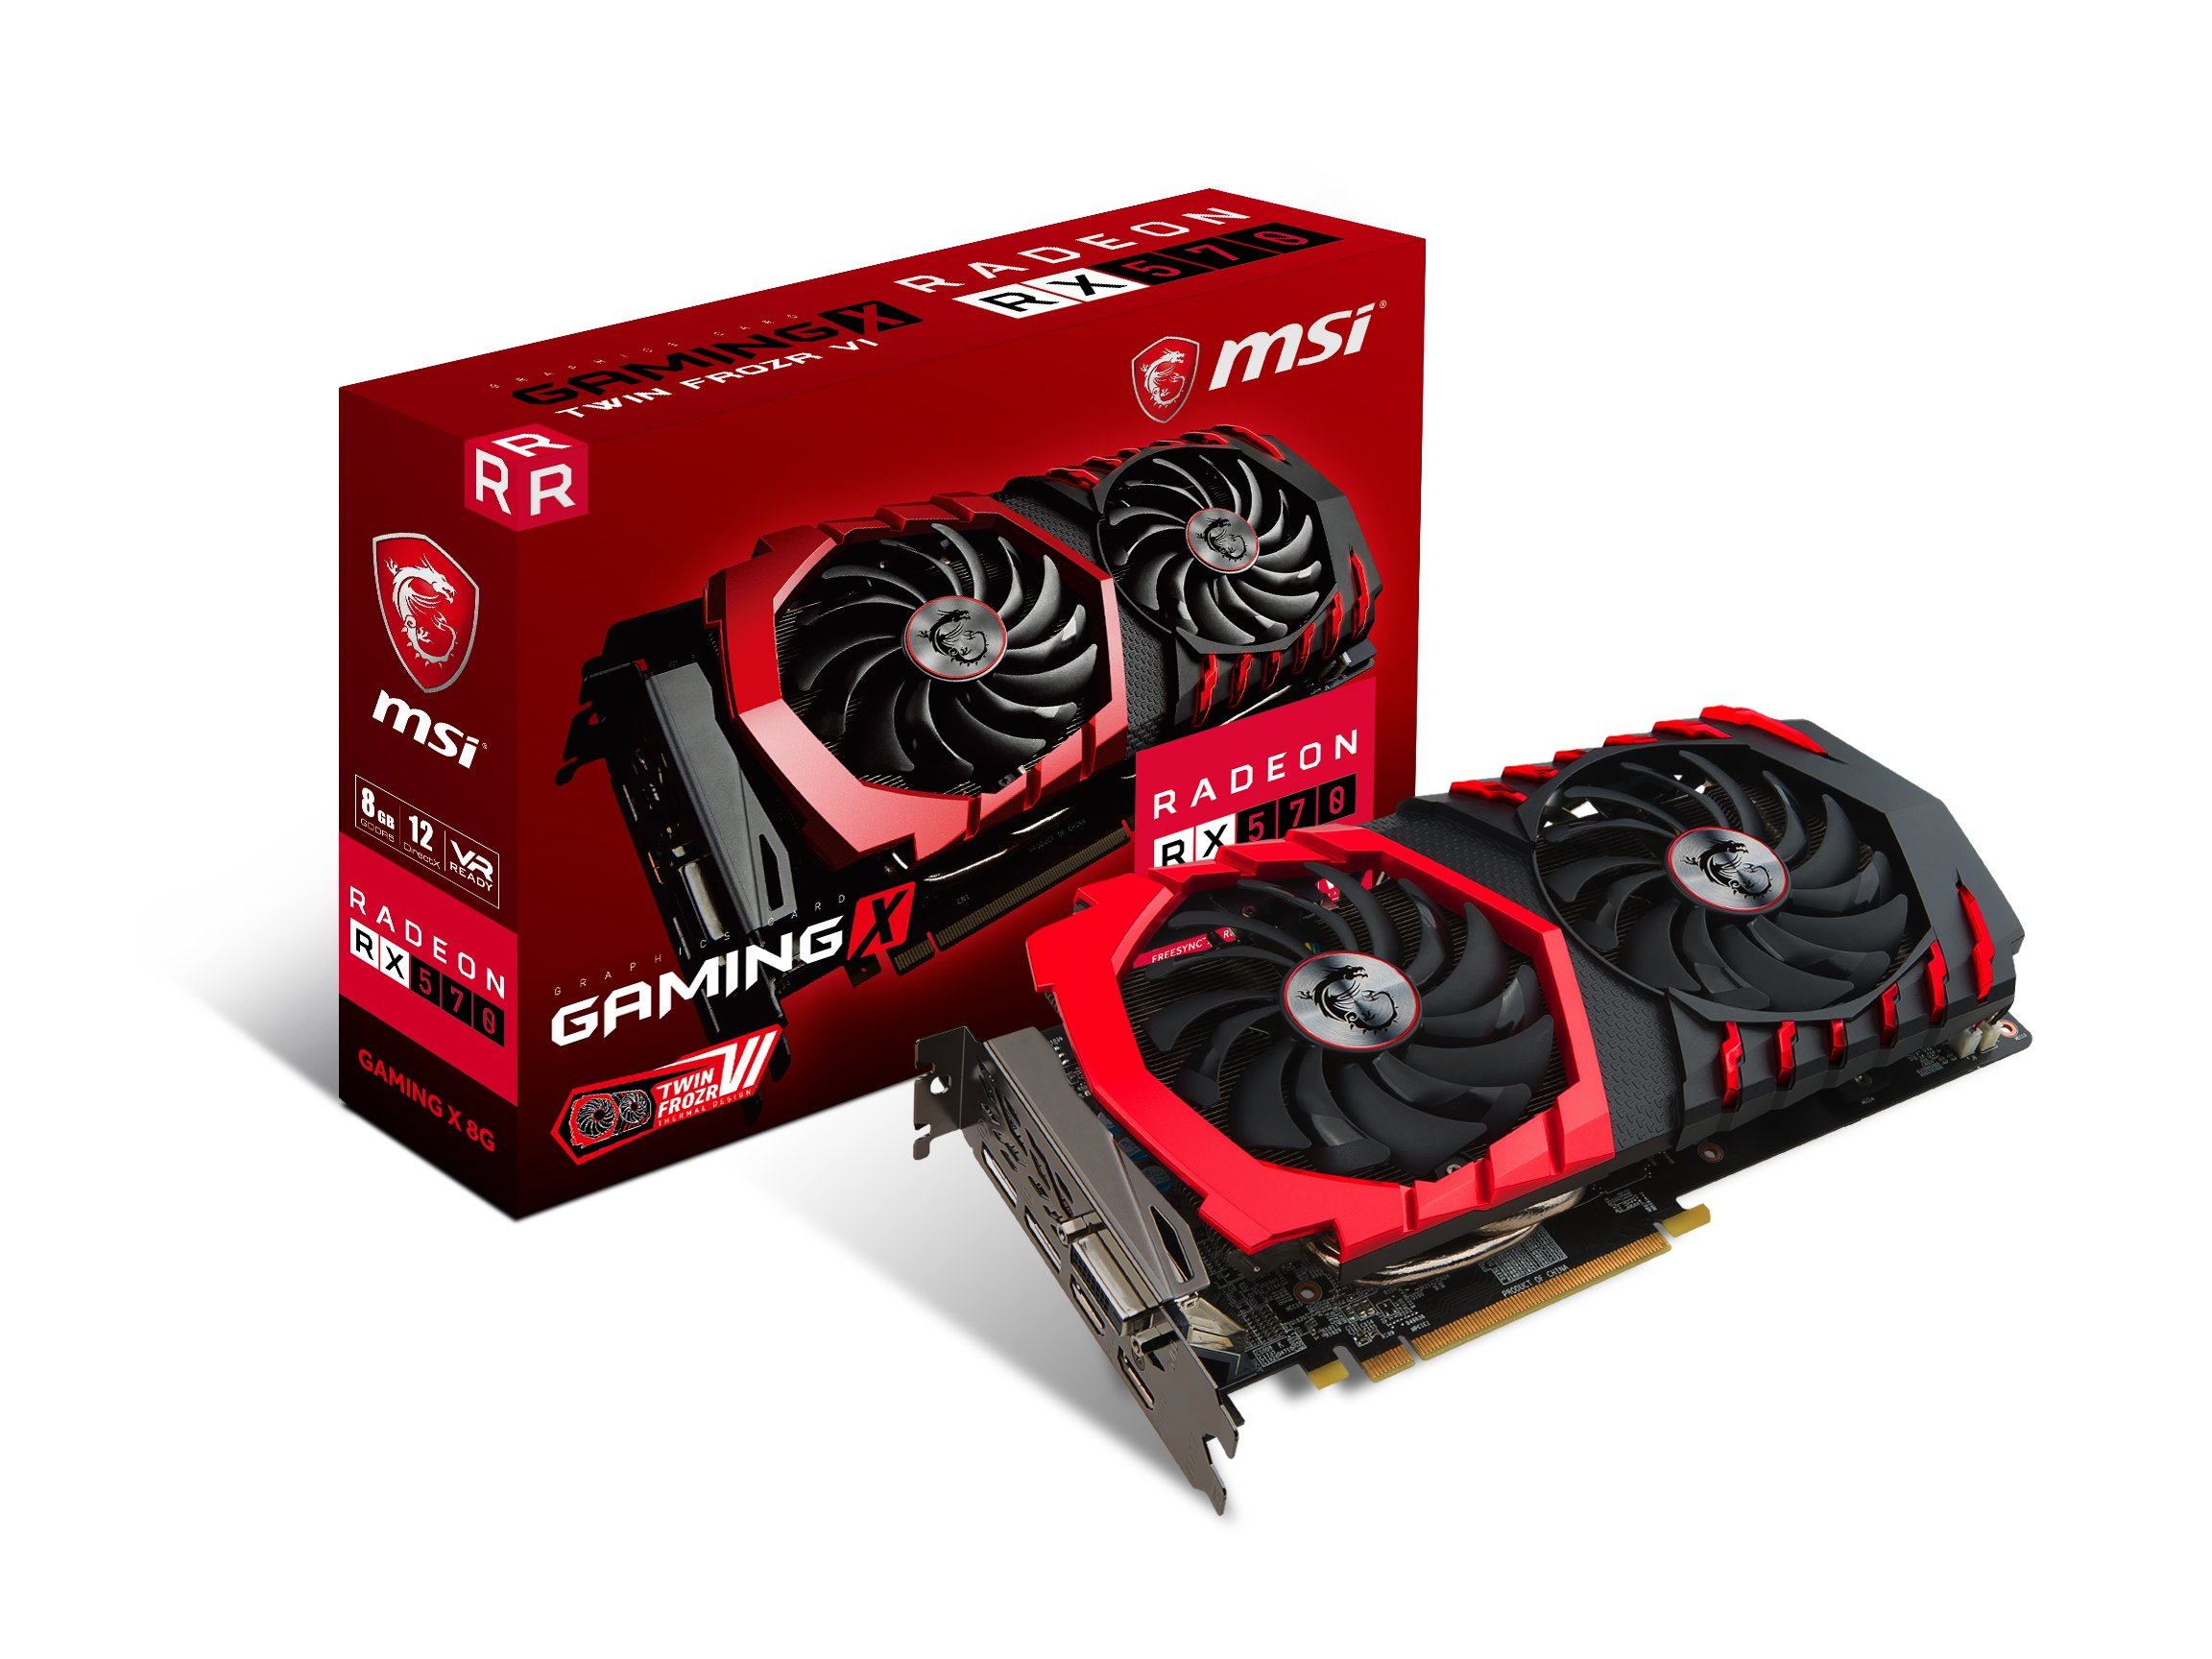 MSI GAMING Radeon RX 570 8GB GDDR5 256-Bit DirectX 12 Graphics Card (RX 570 GAMING X 8G)